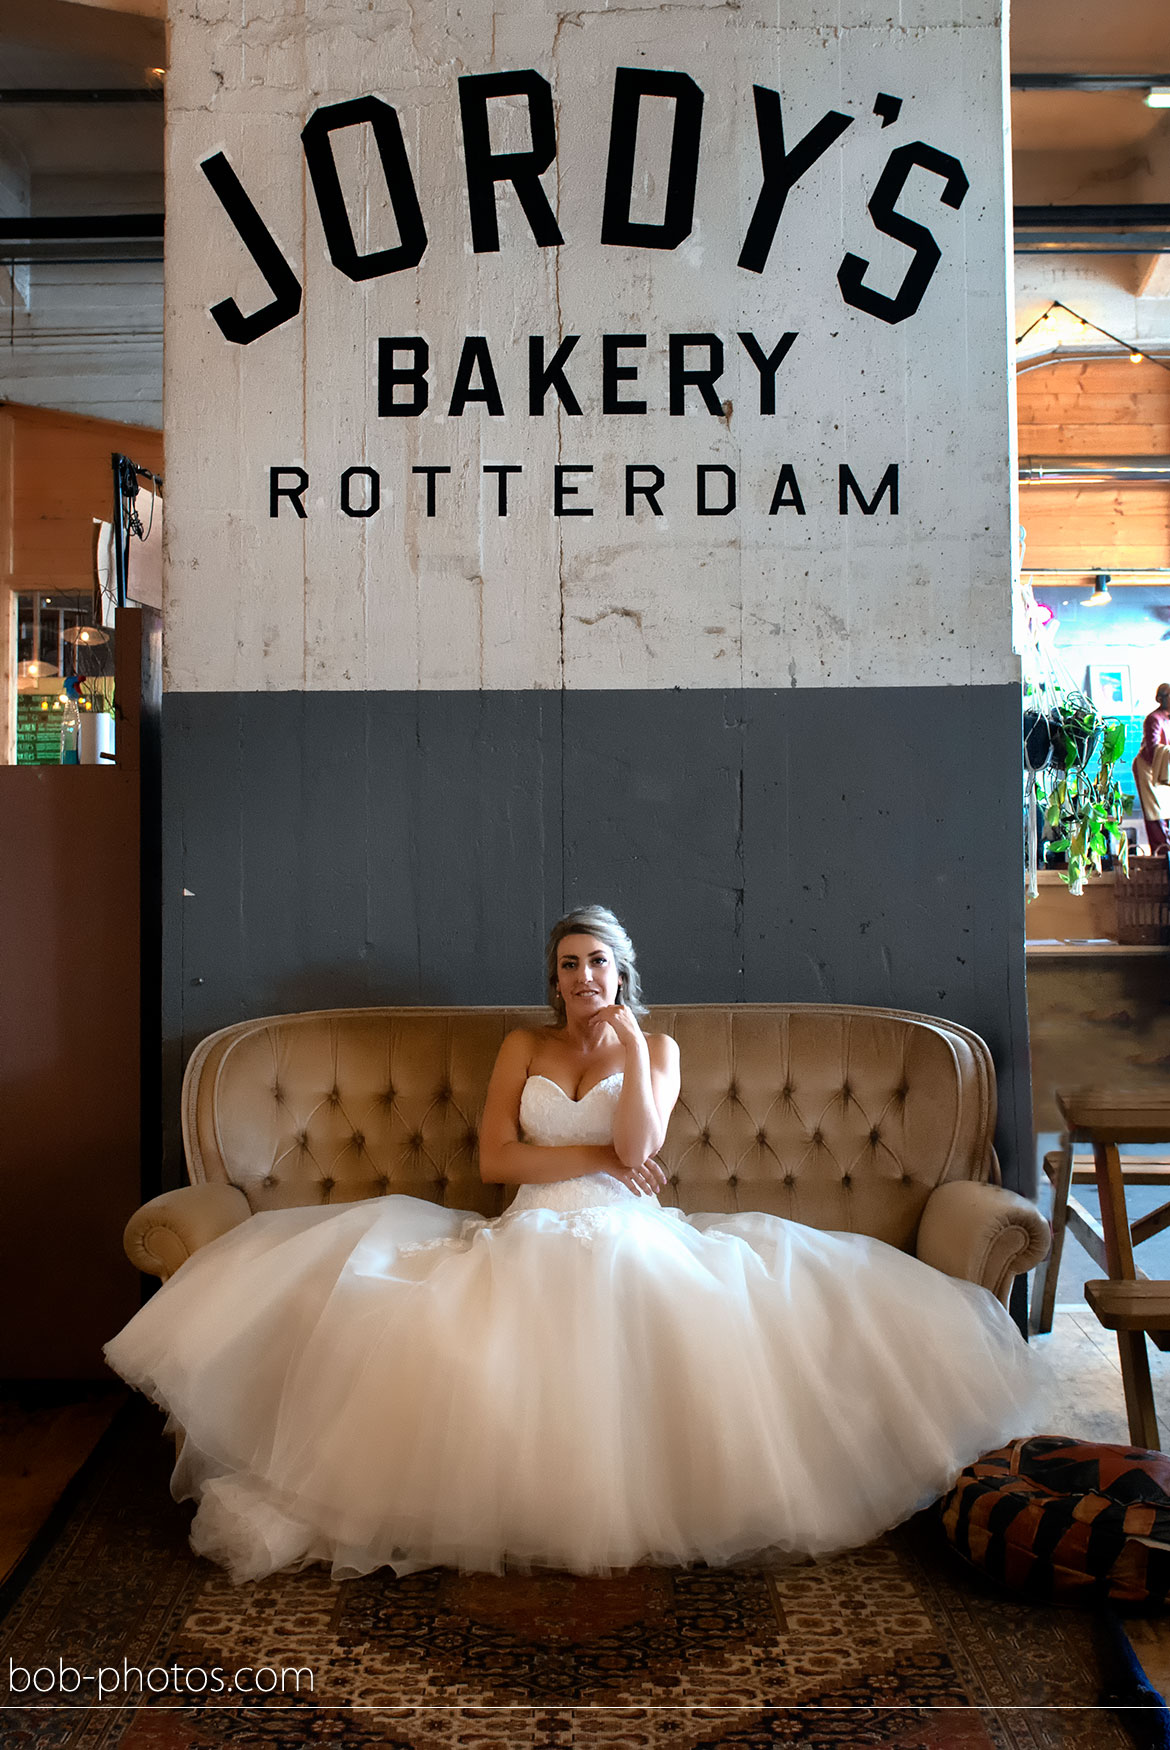 Stephanie's Bruidsboutique Spijkenisse jordy's bakery rotterdam bruidsfotografie Rhoon